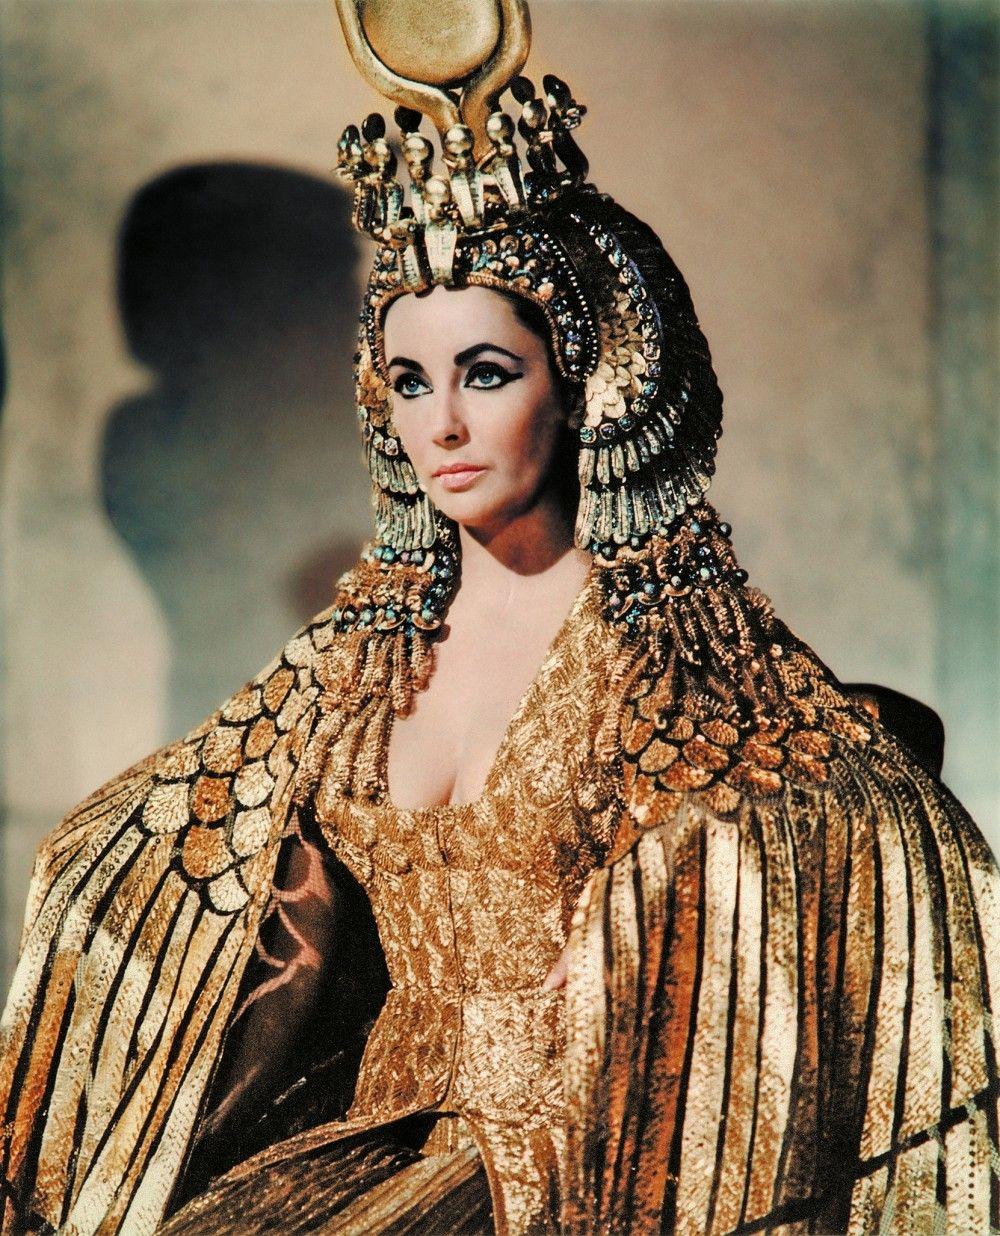 DIY Cleopatra Halloween Costume Tutorial | Cleopatra, Elizabeth ...